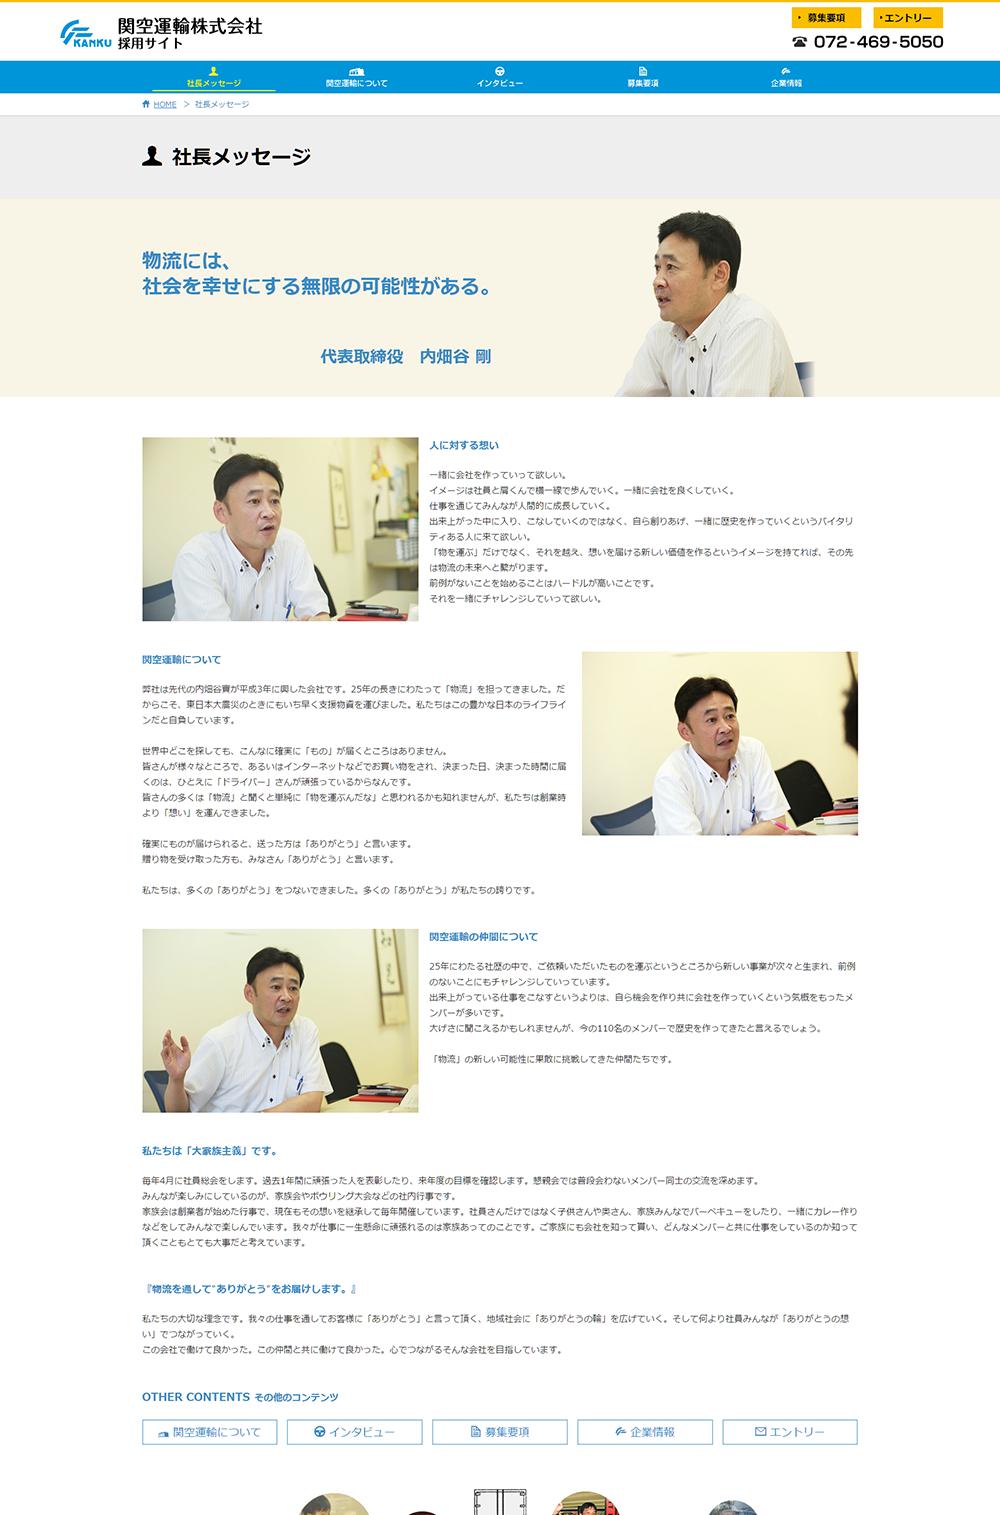 kanku-unyu_recruit2